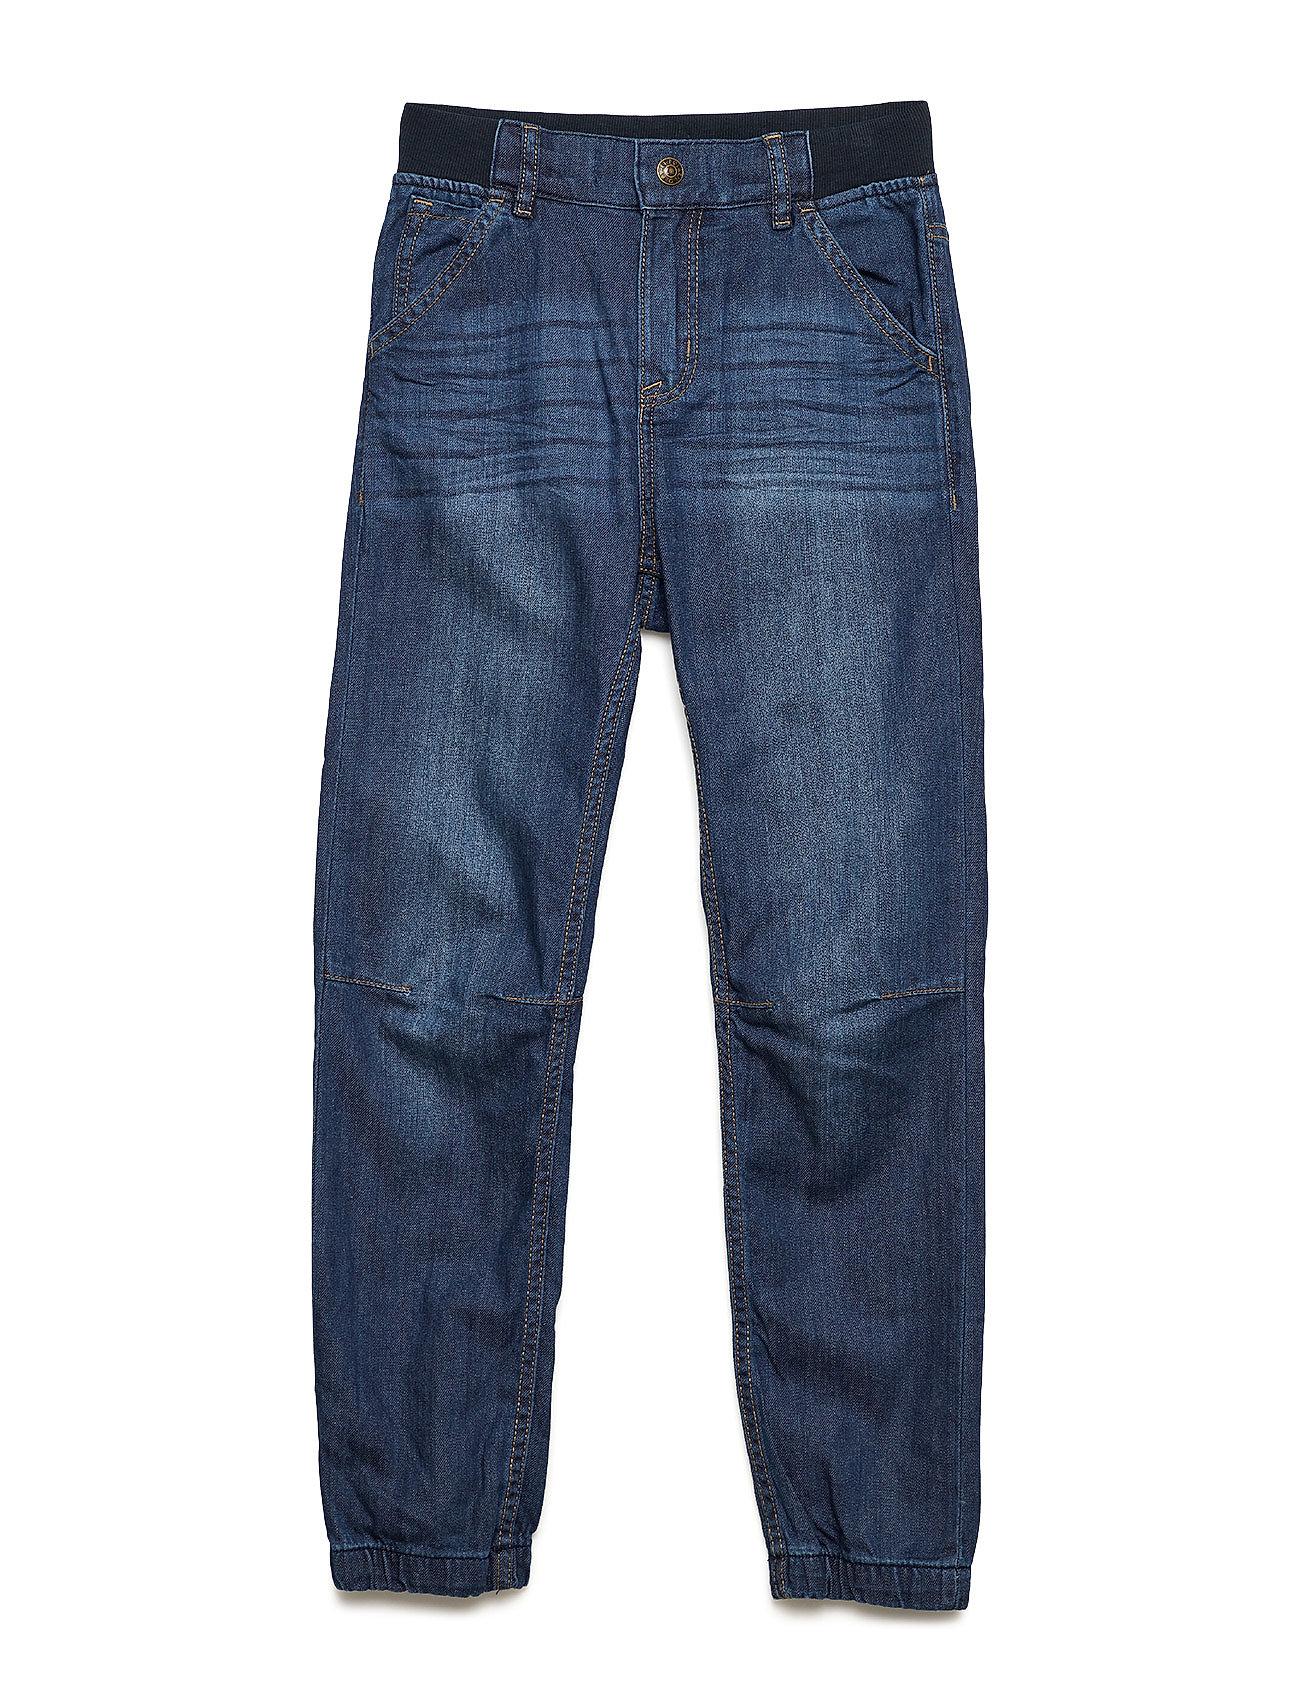 Polarn O. Pyret Trousers Woven School - BLUE DENIM